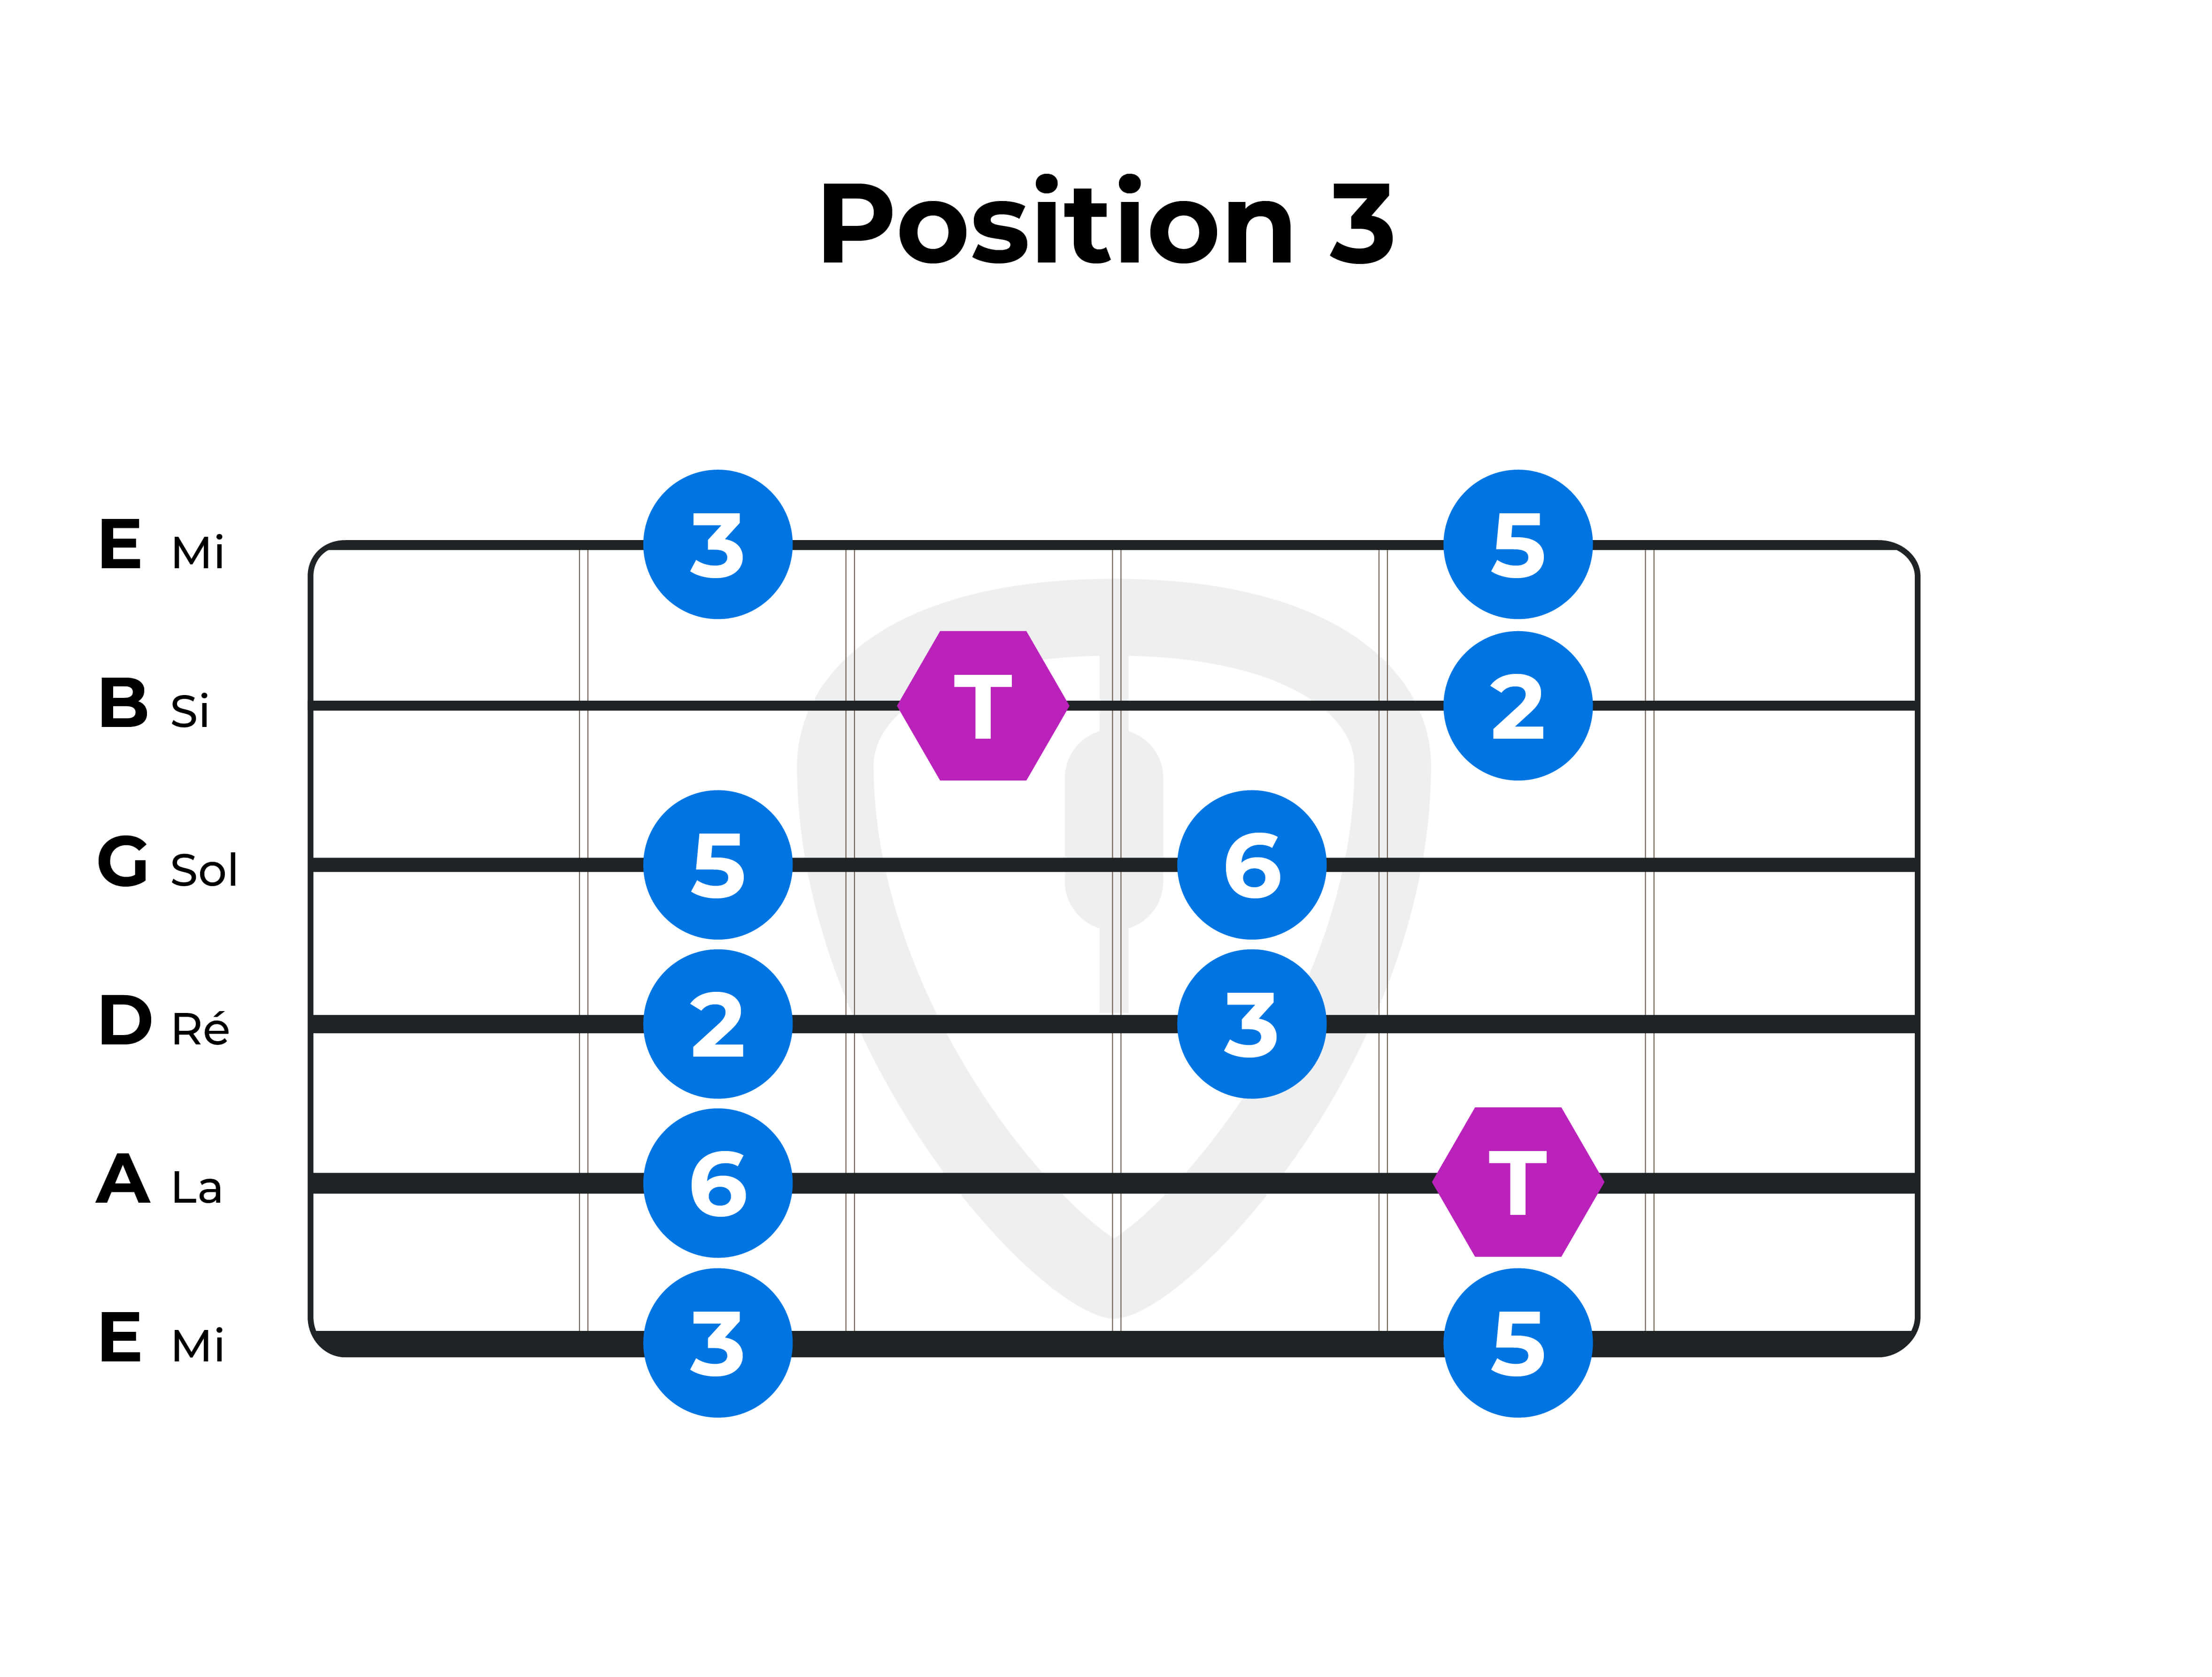 gamme pentatonique majeure guitare position 3